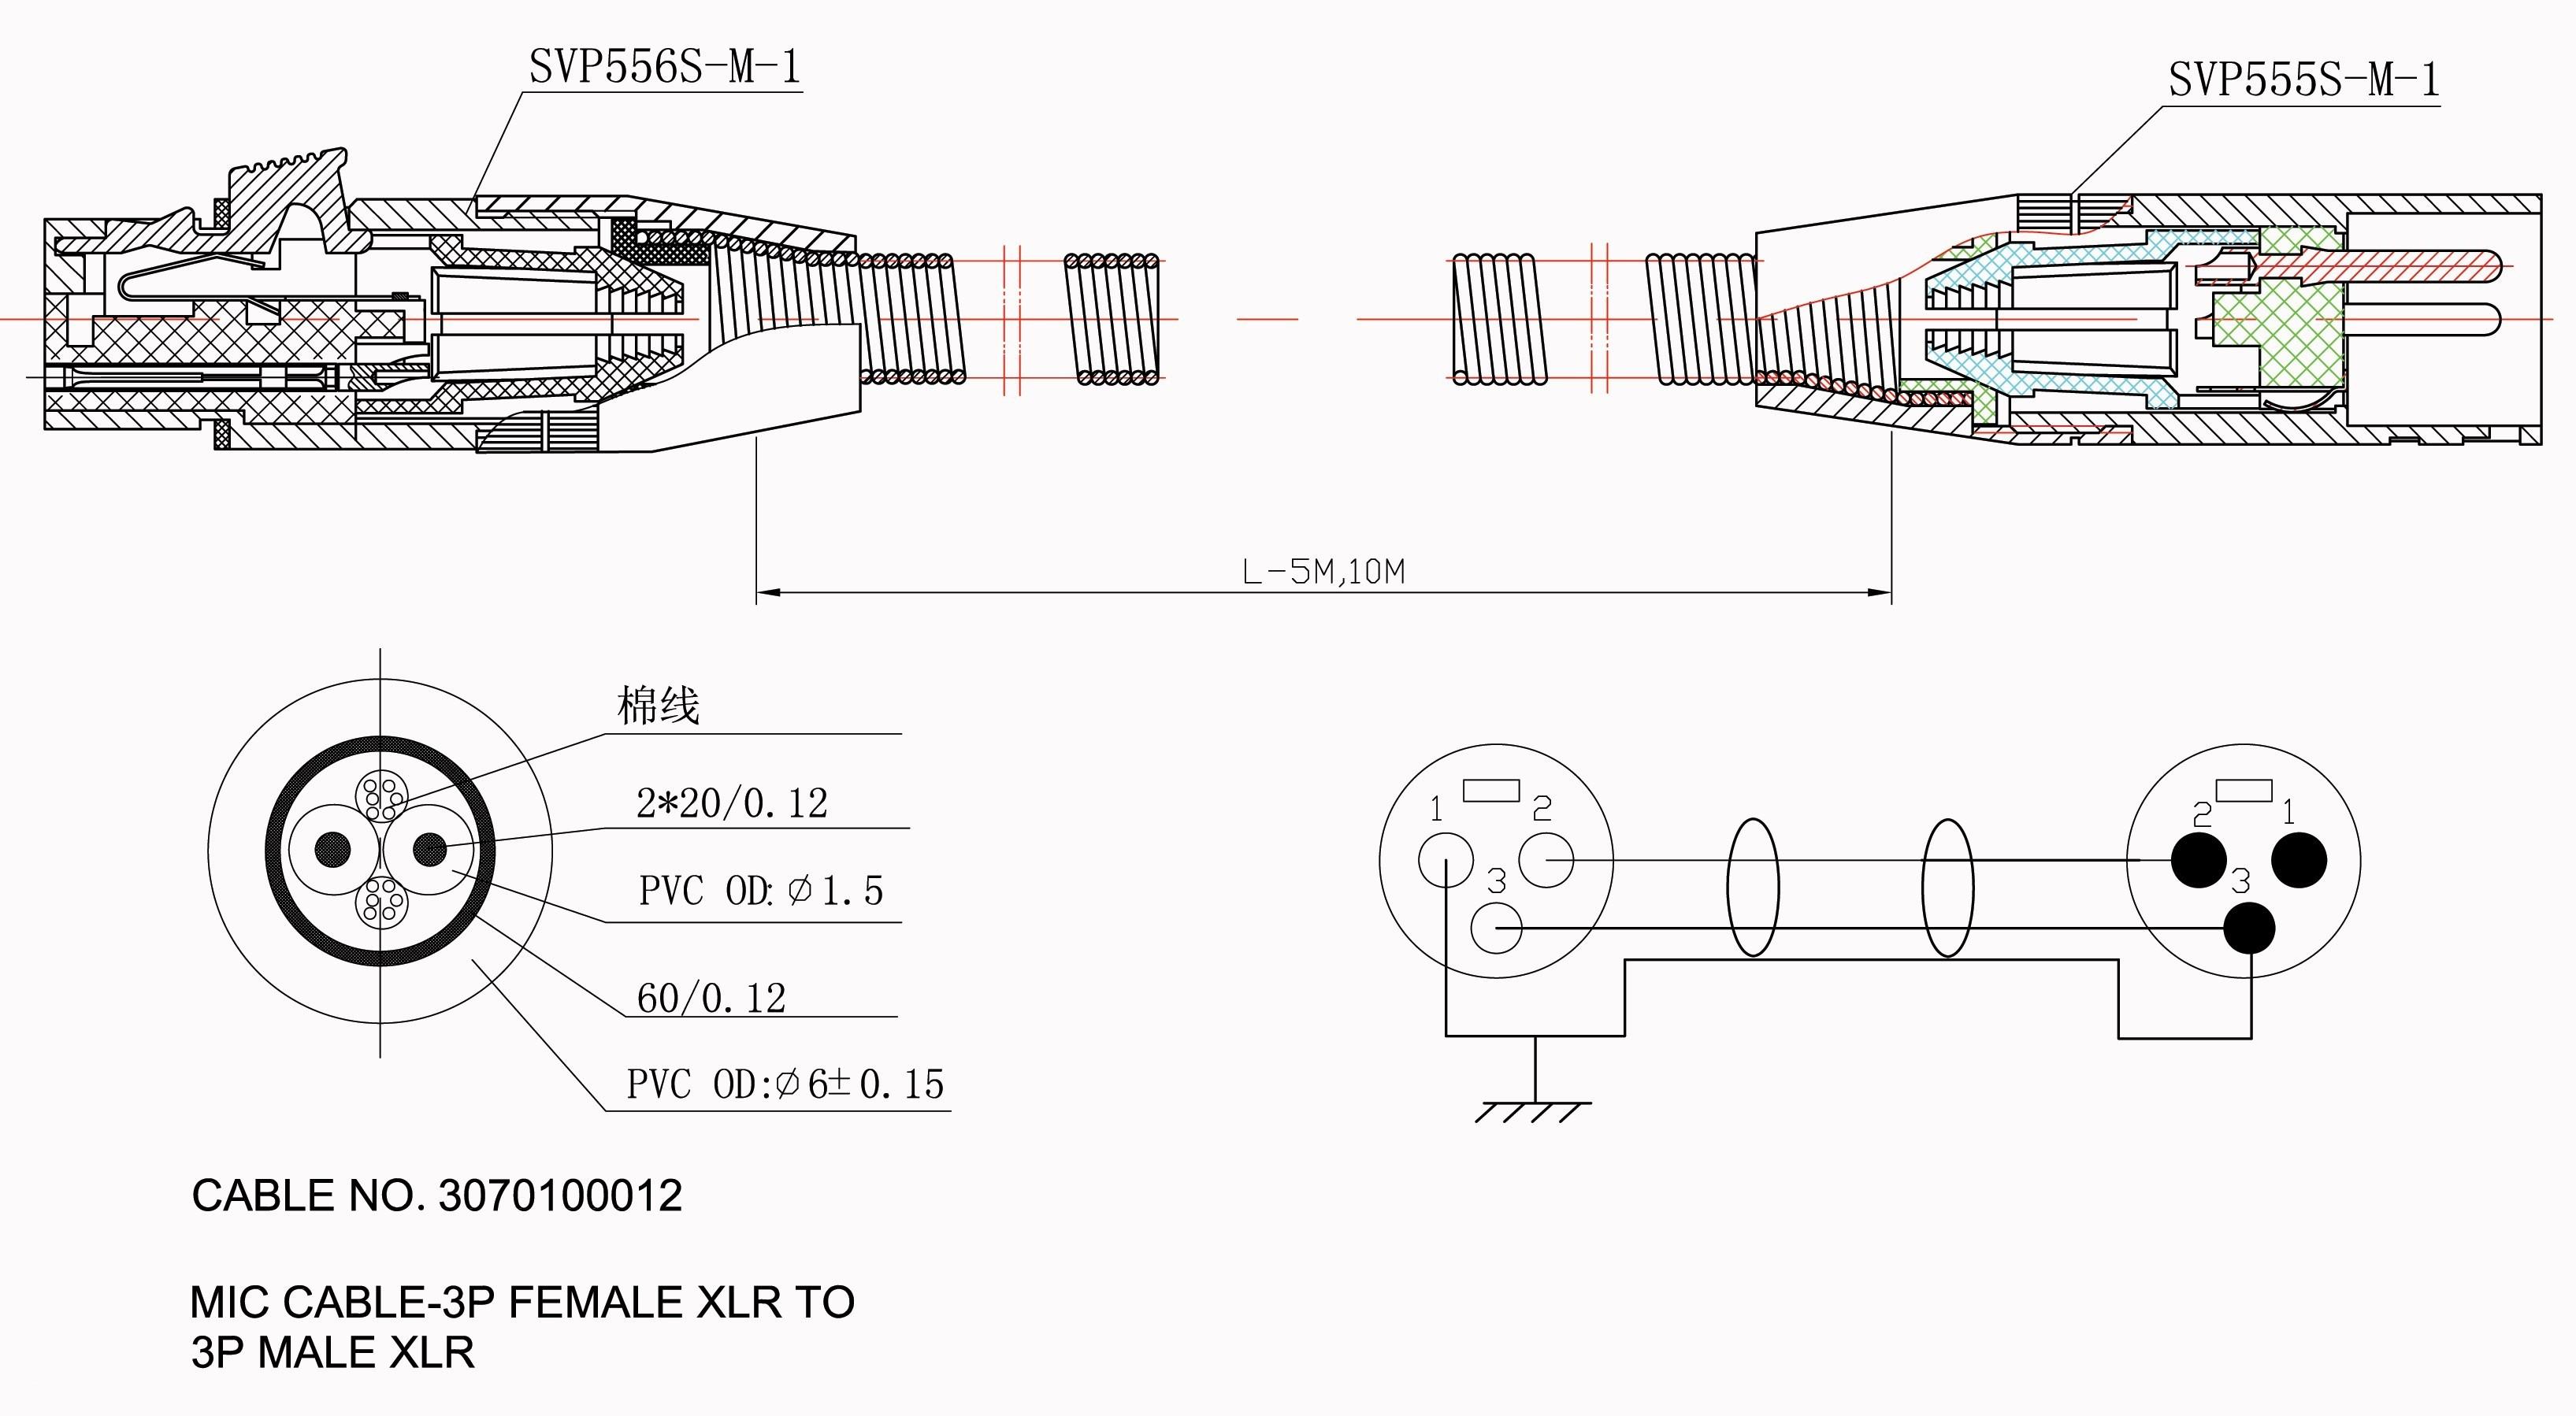 Wiring Diagram 220v Baseboard Heater Fresh 220v Wiring Diagram New Unique 220v Wiring Diagram Diagram